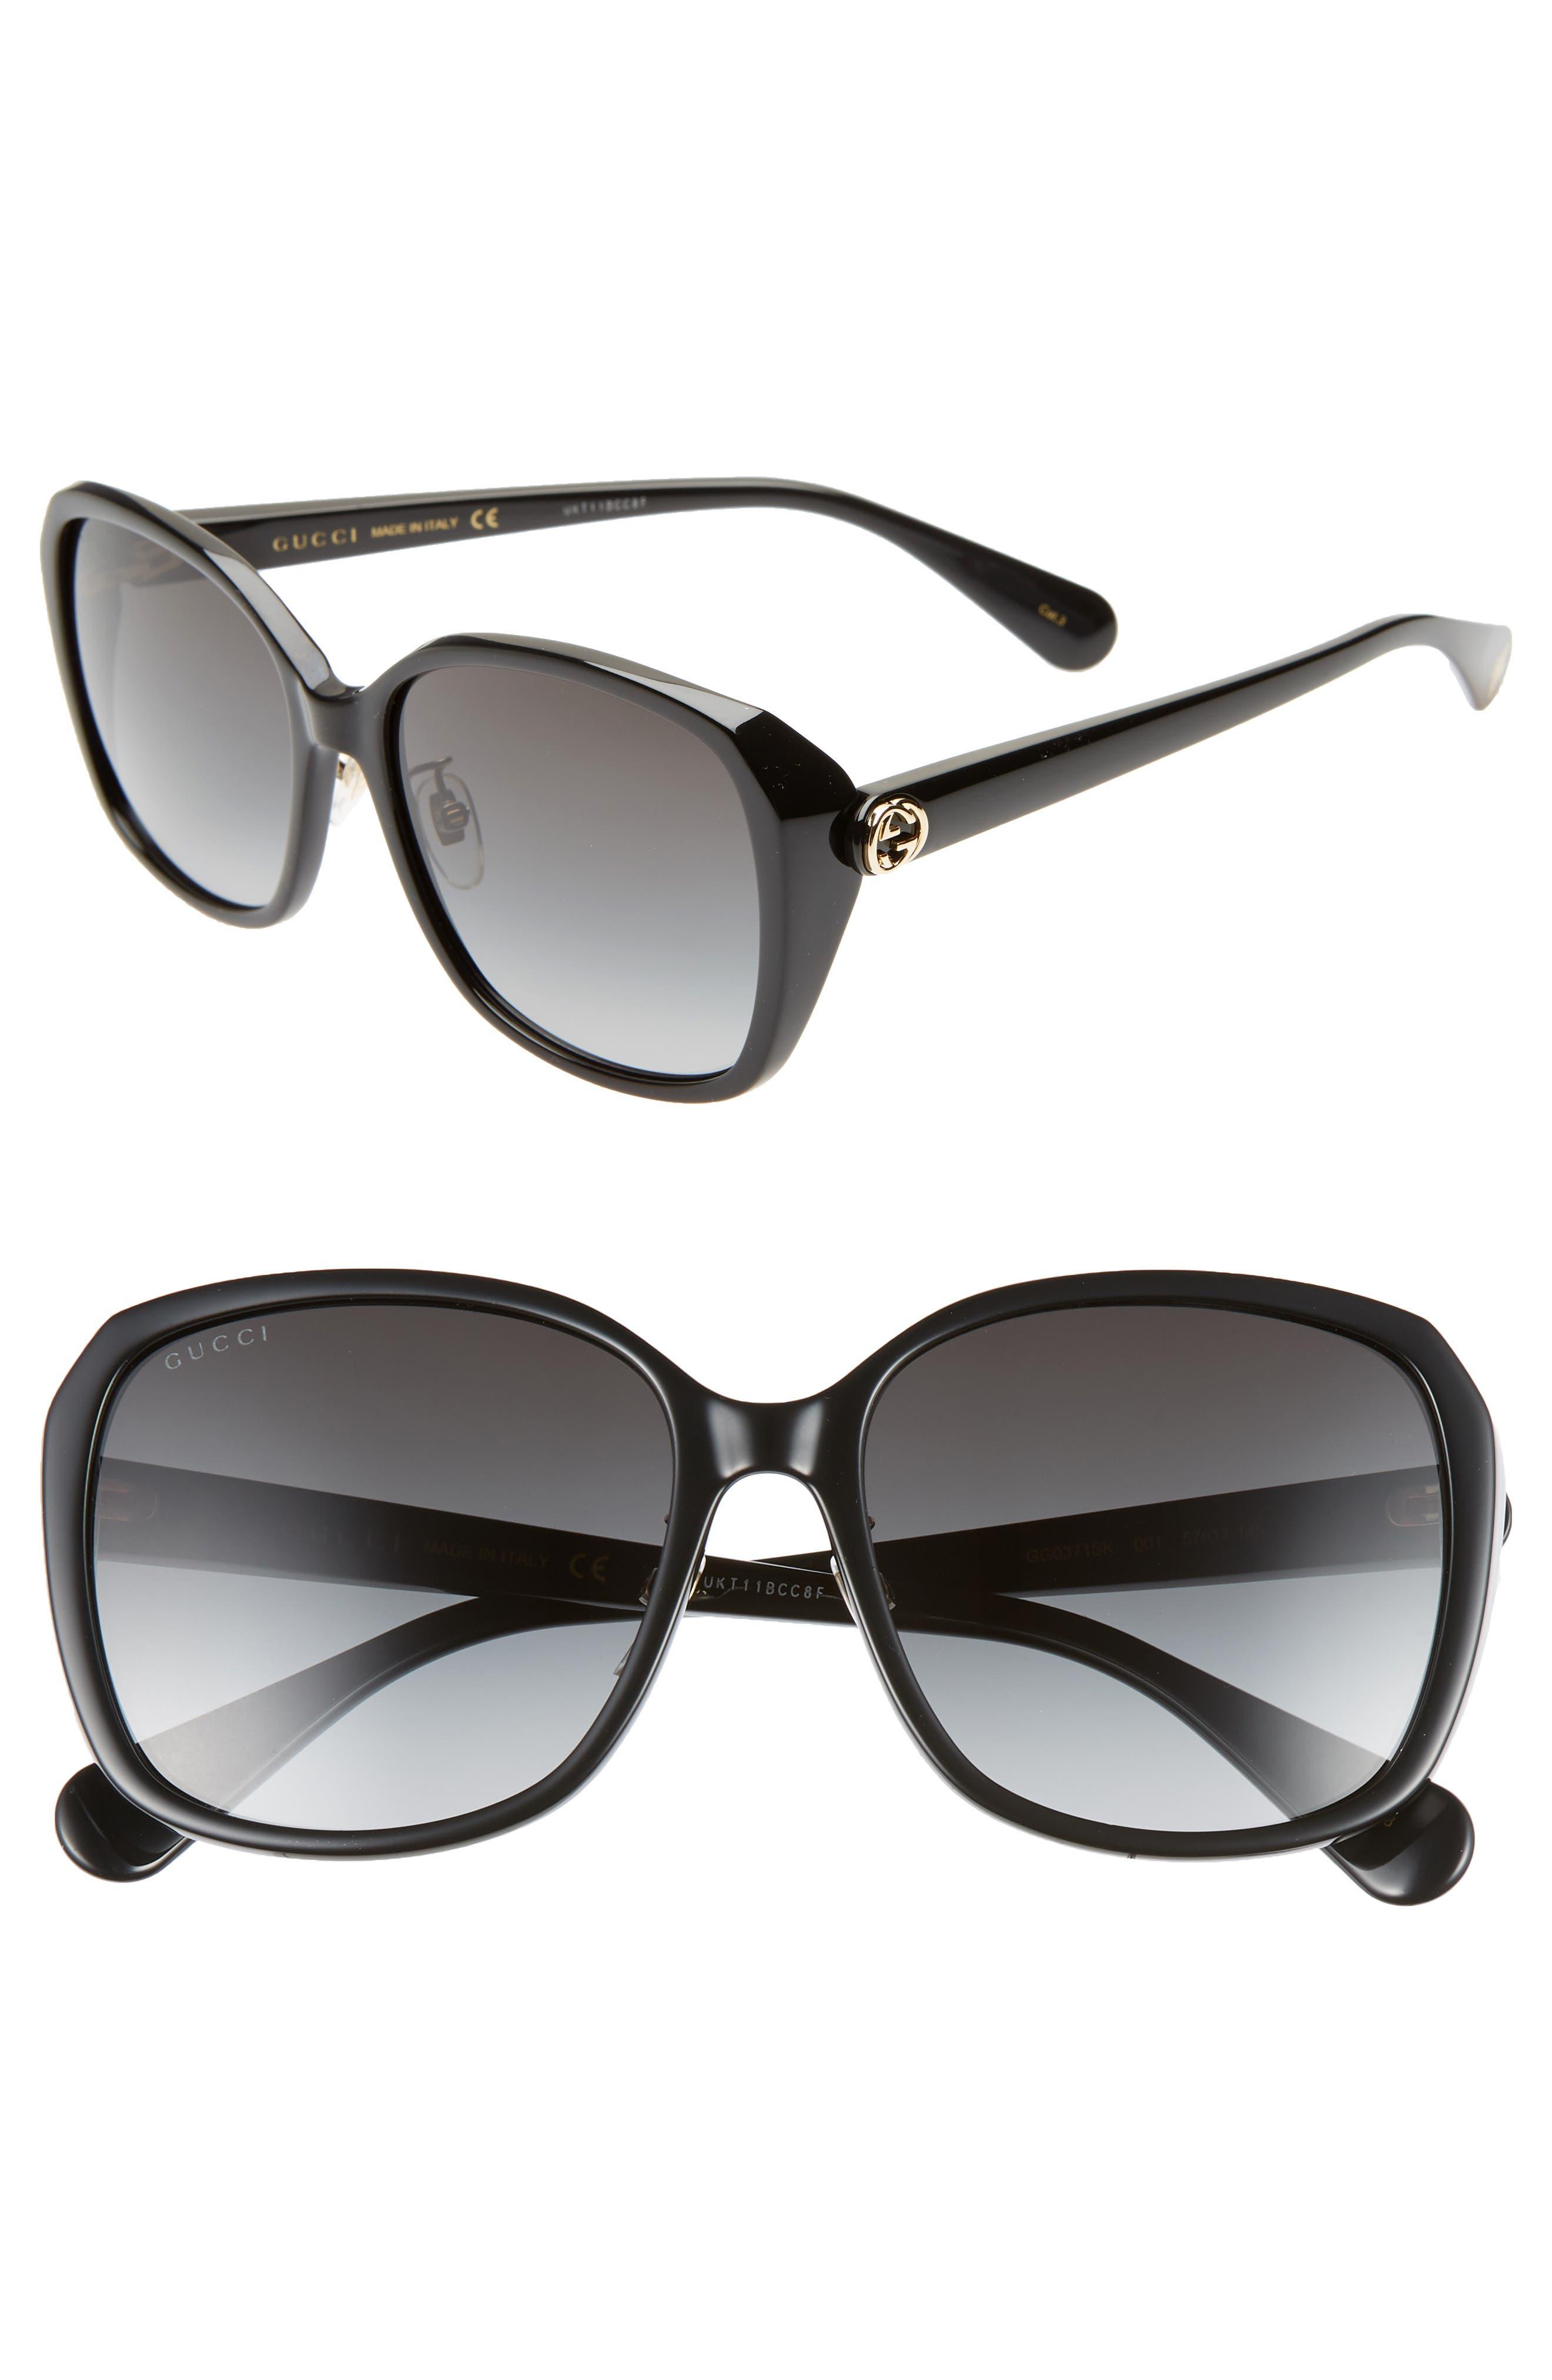 GUCCI, 57mm Square Sunglasses, Main thumbnail 1, color, BLACK